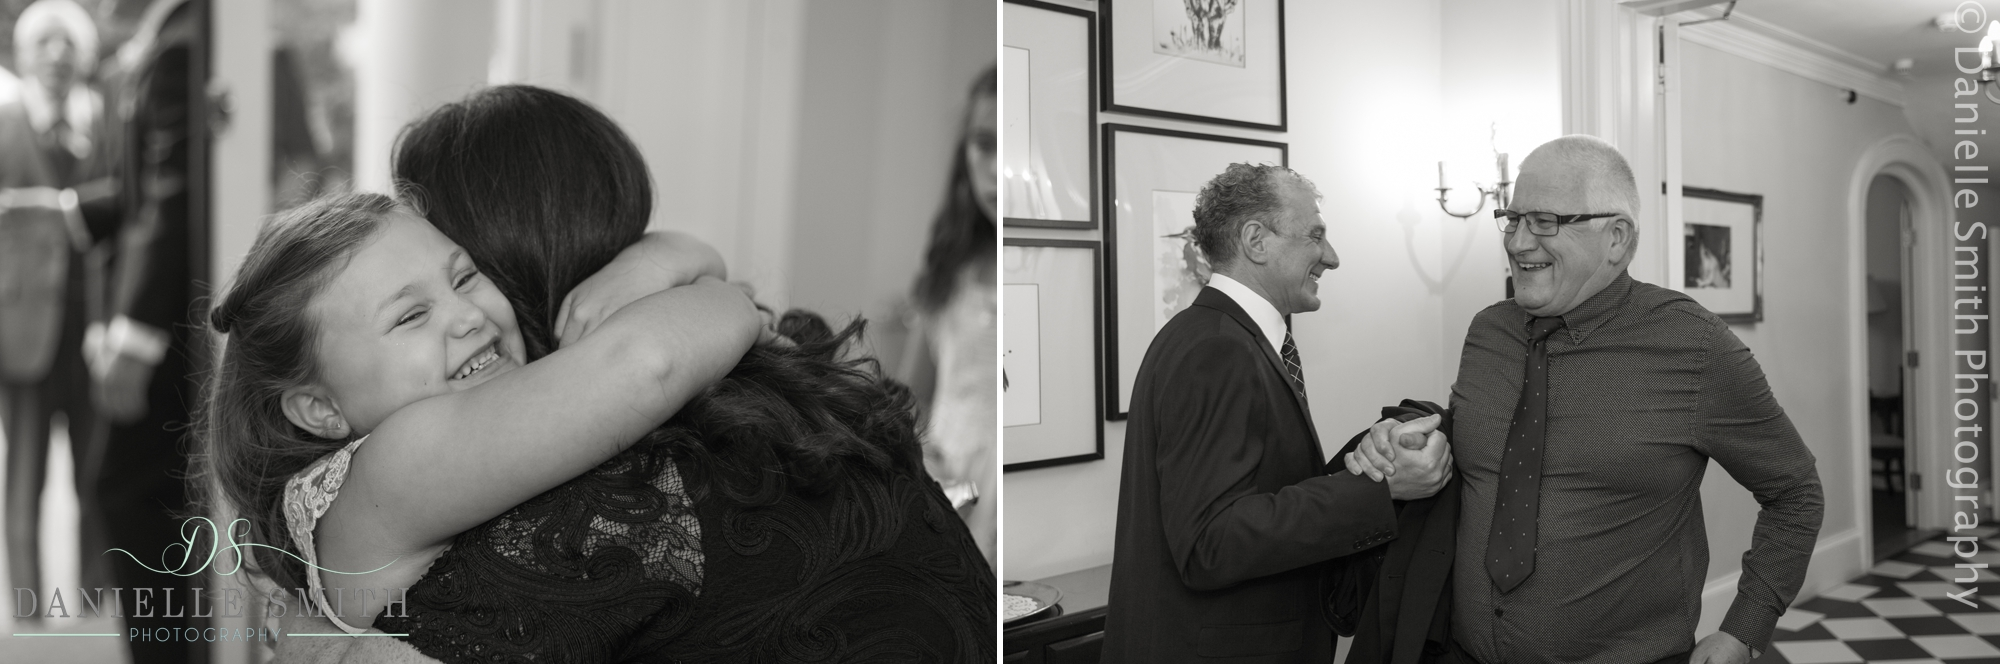 wedding guests having fun - fennes intimate wedding